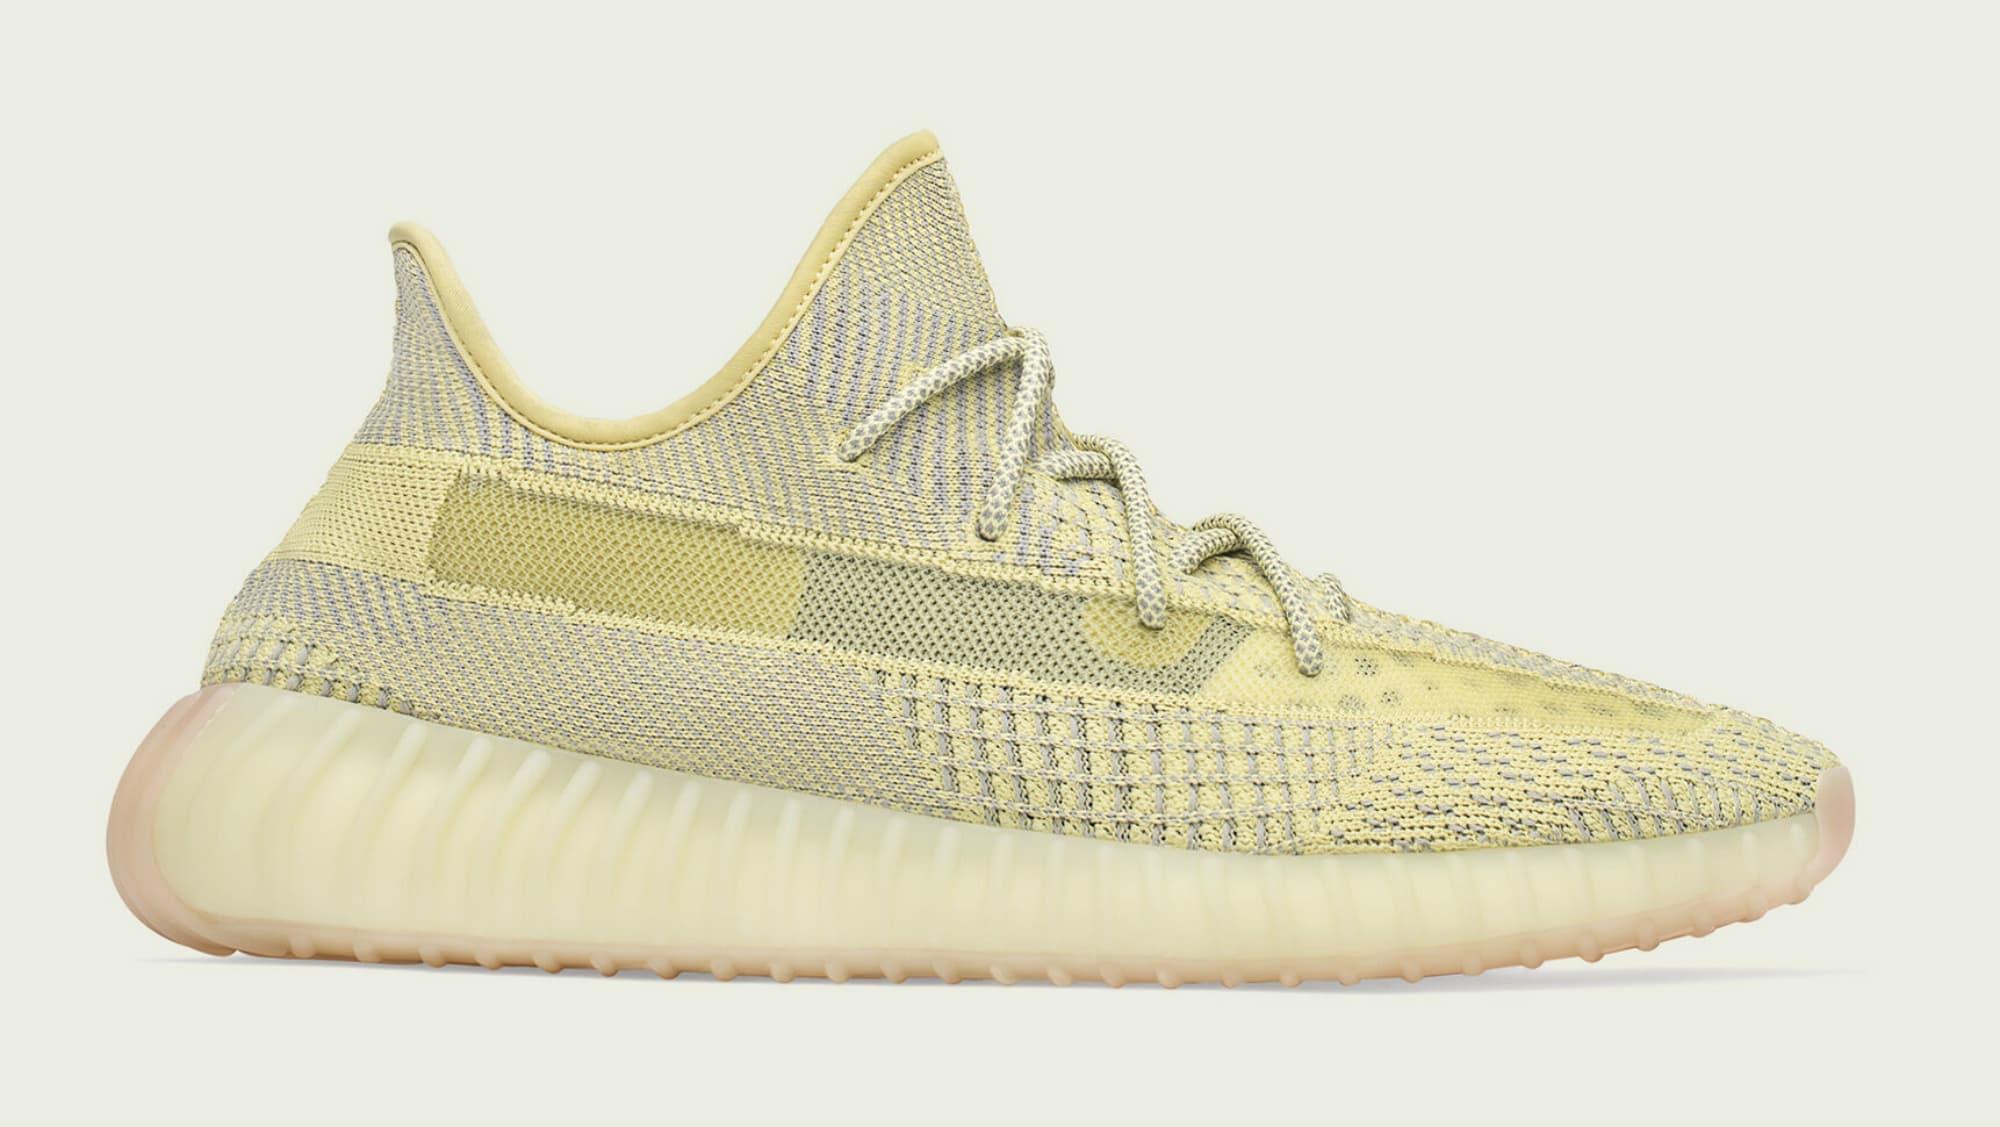 adidas-yeezy-boost-350-v2-antlia-fv3250-release-date